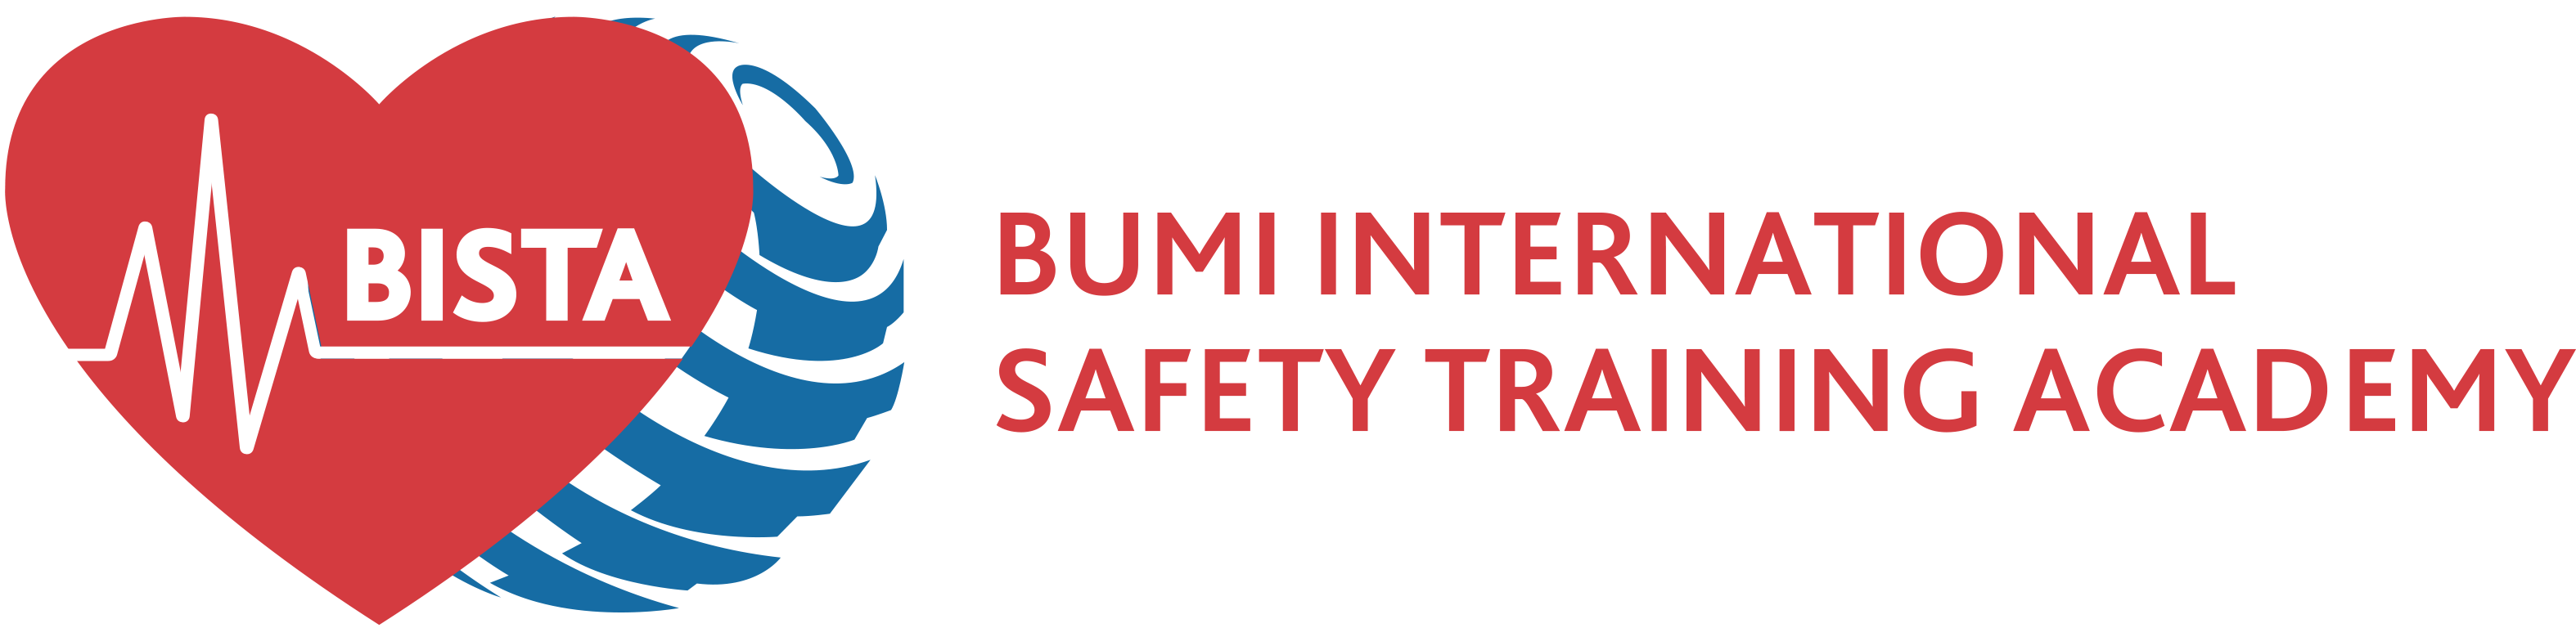 BIST Academy Sdn Bhd | Safety Training Academy Malaysia